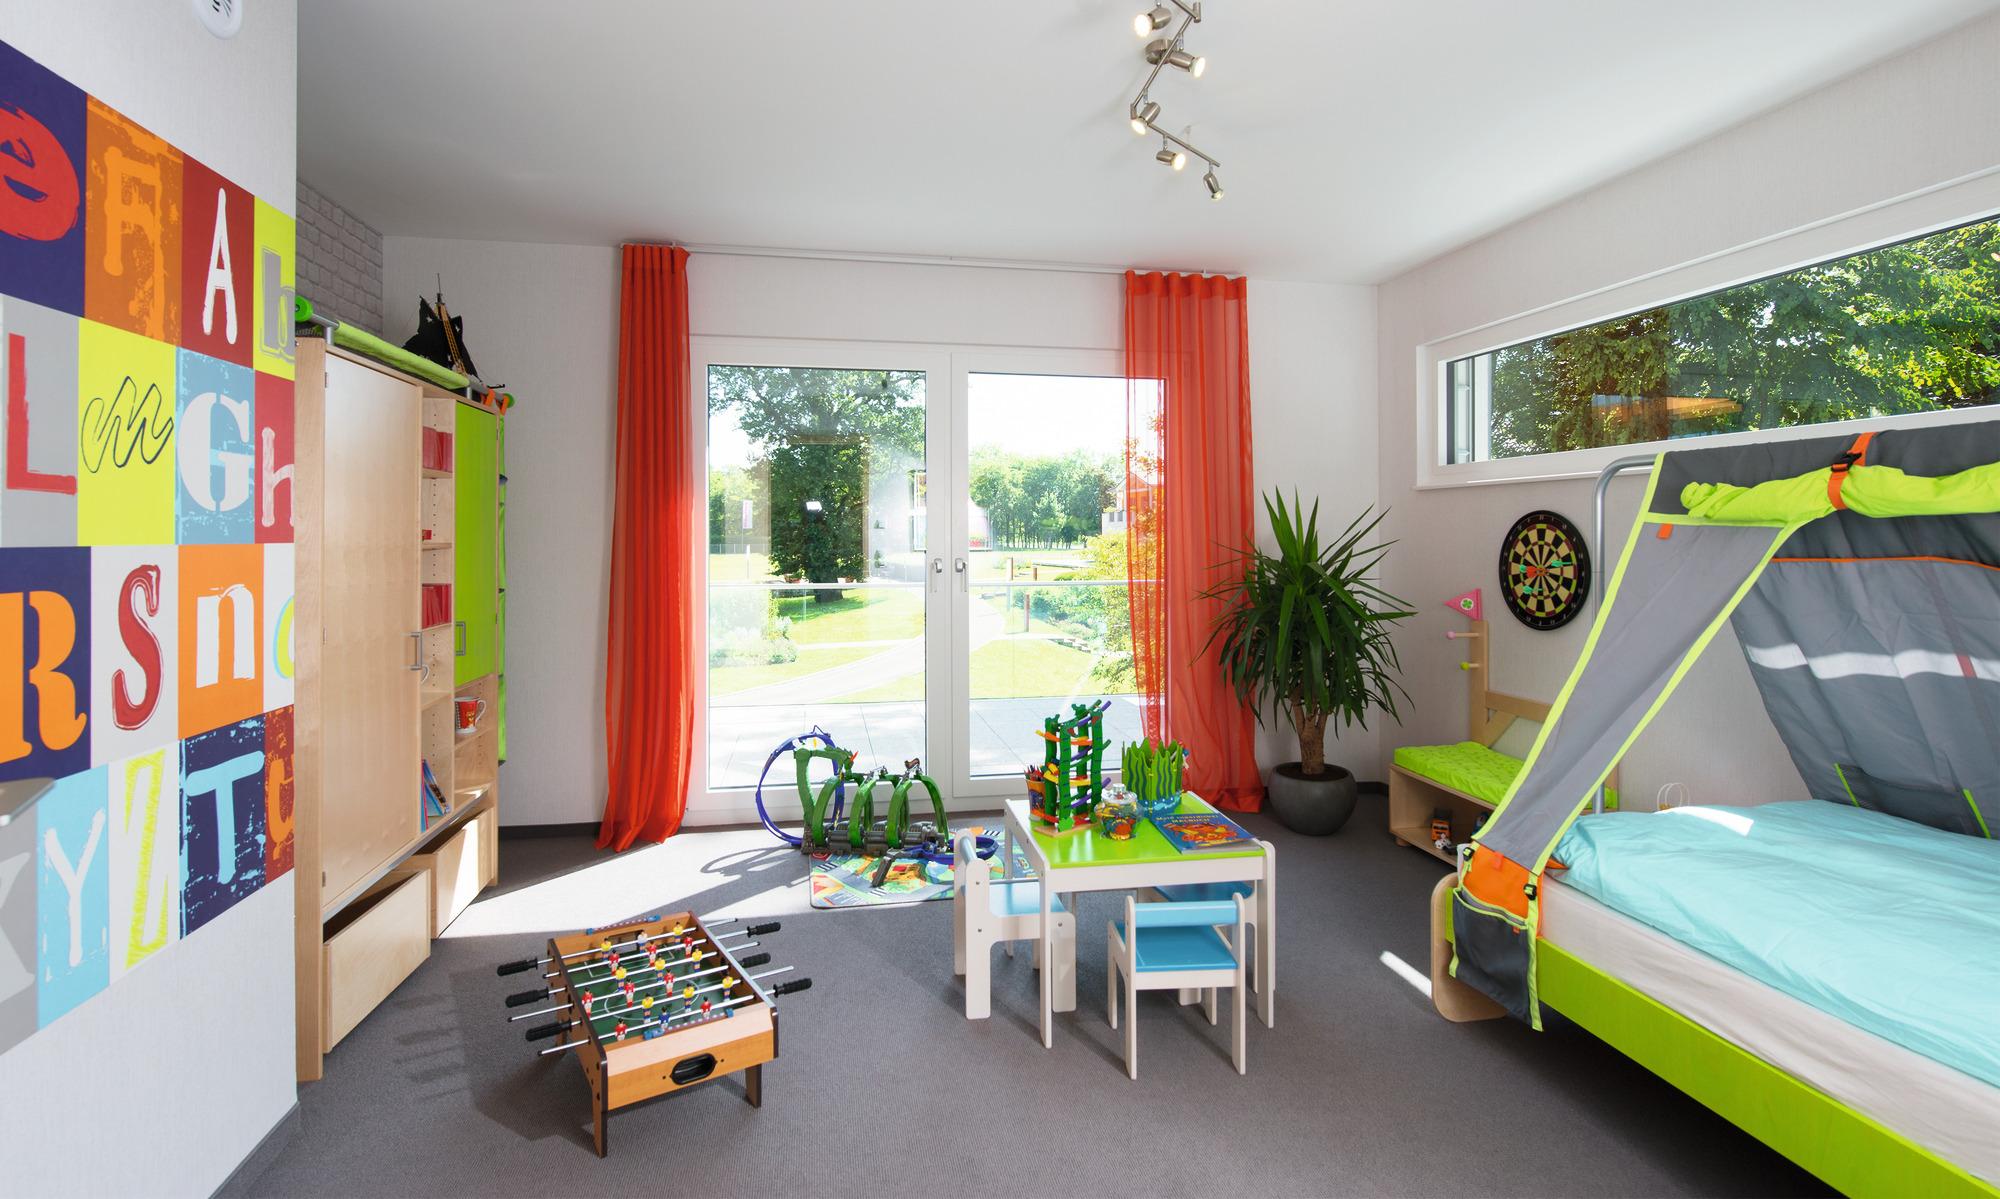 Contemporary, eco-friendly prefabricated house